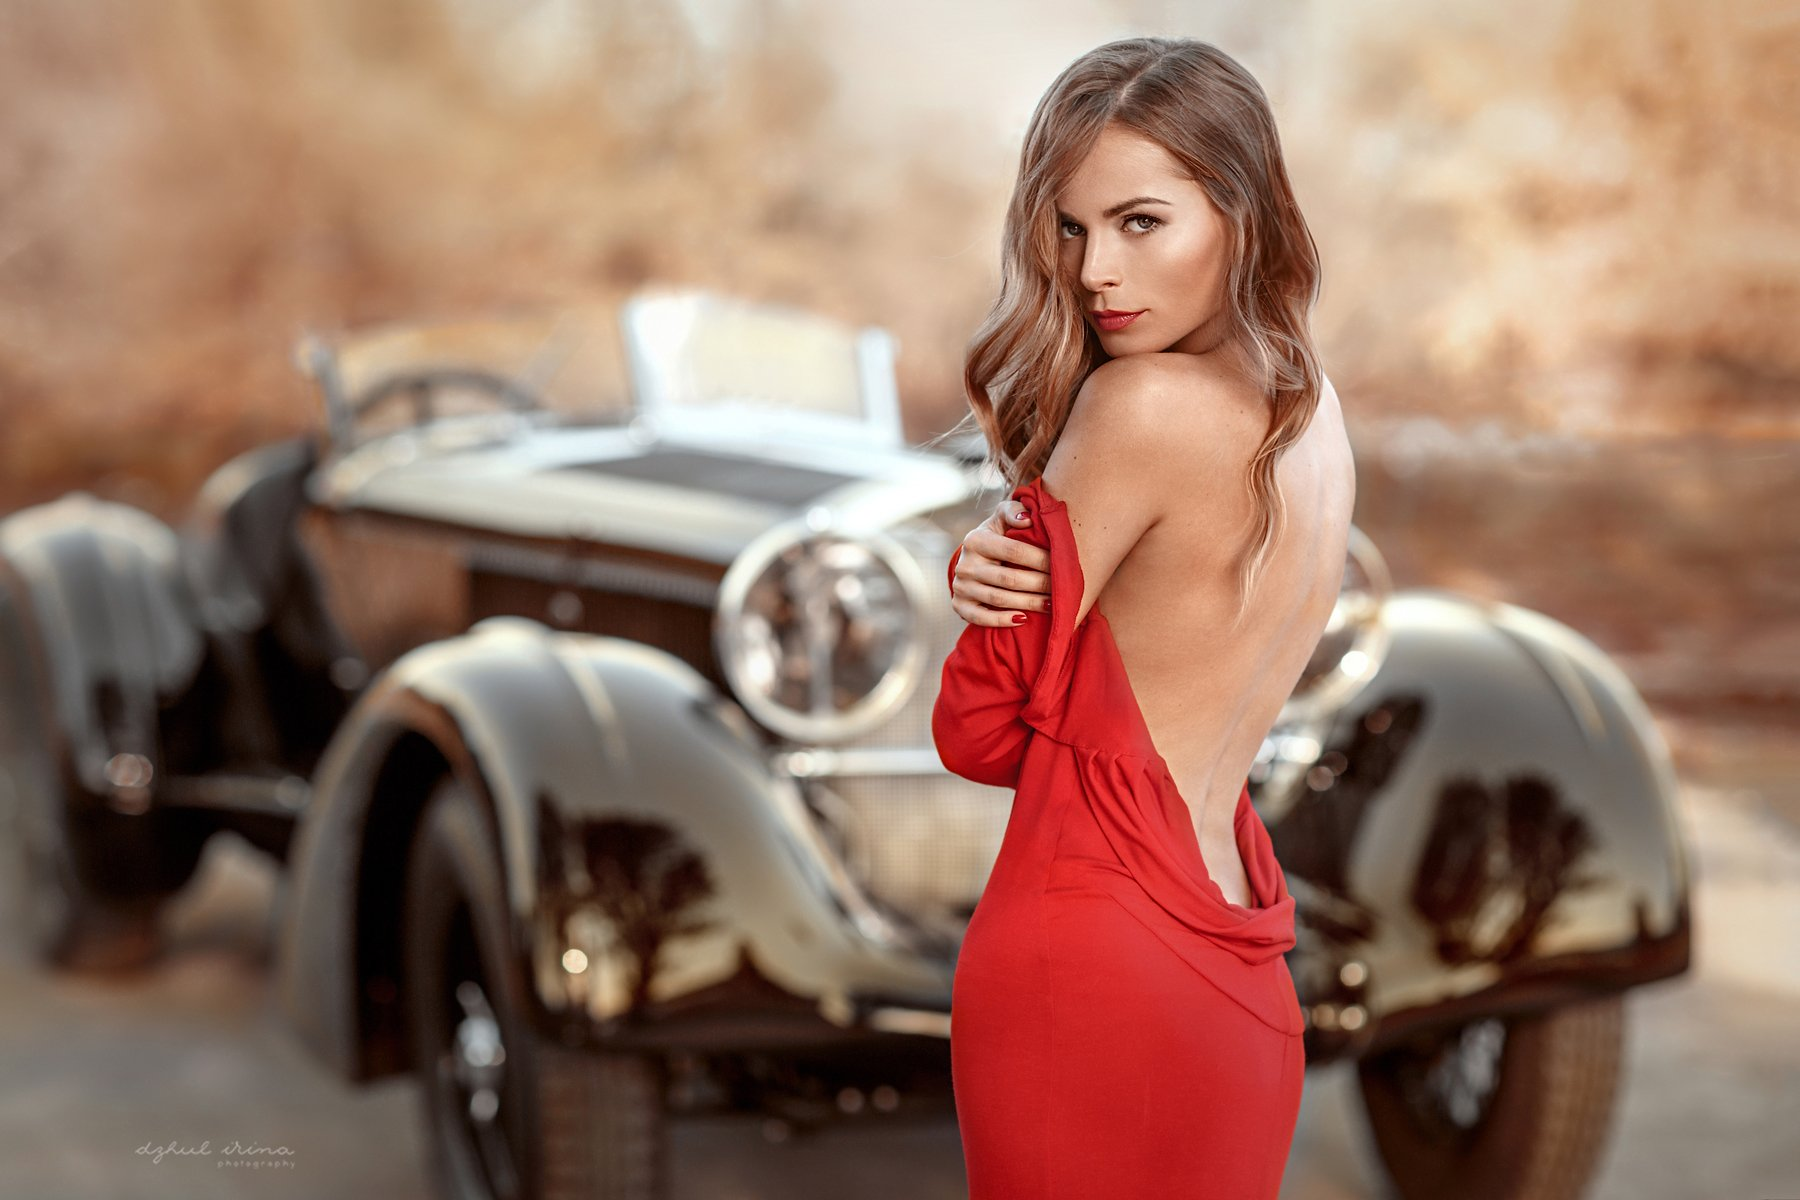 Beautiful, Canon, Canon 5D Mark III, Car, Dzhul irina, Girl, Irinadzhul, People, Photo, Photography, Photoshop, Popular, Portrait, Red, Девушка, Портерт, Ирина Джуль